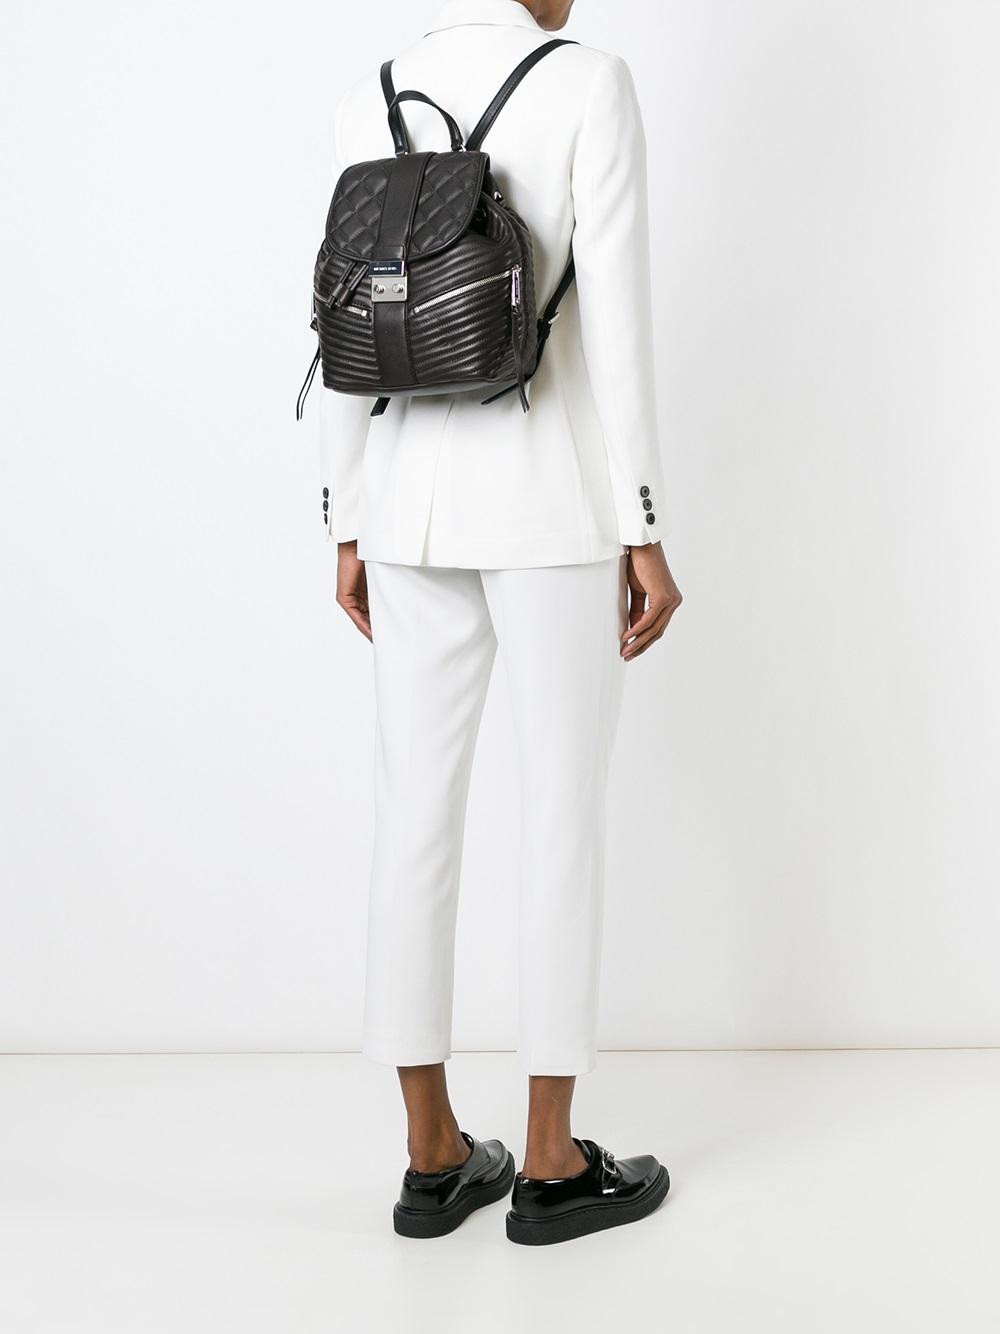 75cb3a0545c6 MICHAEL Michael Kors Elisa Small Backpack in Black - Lyst